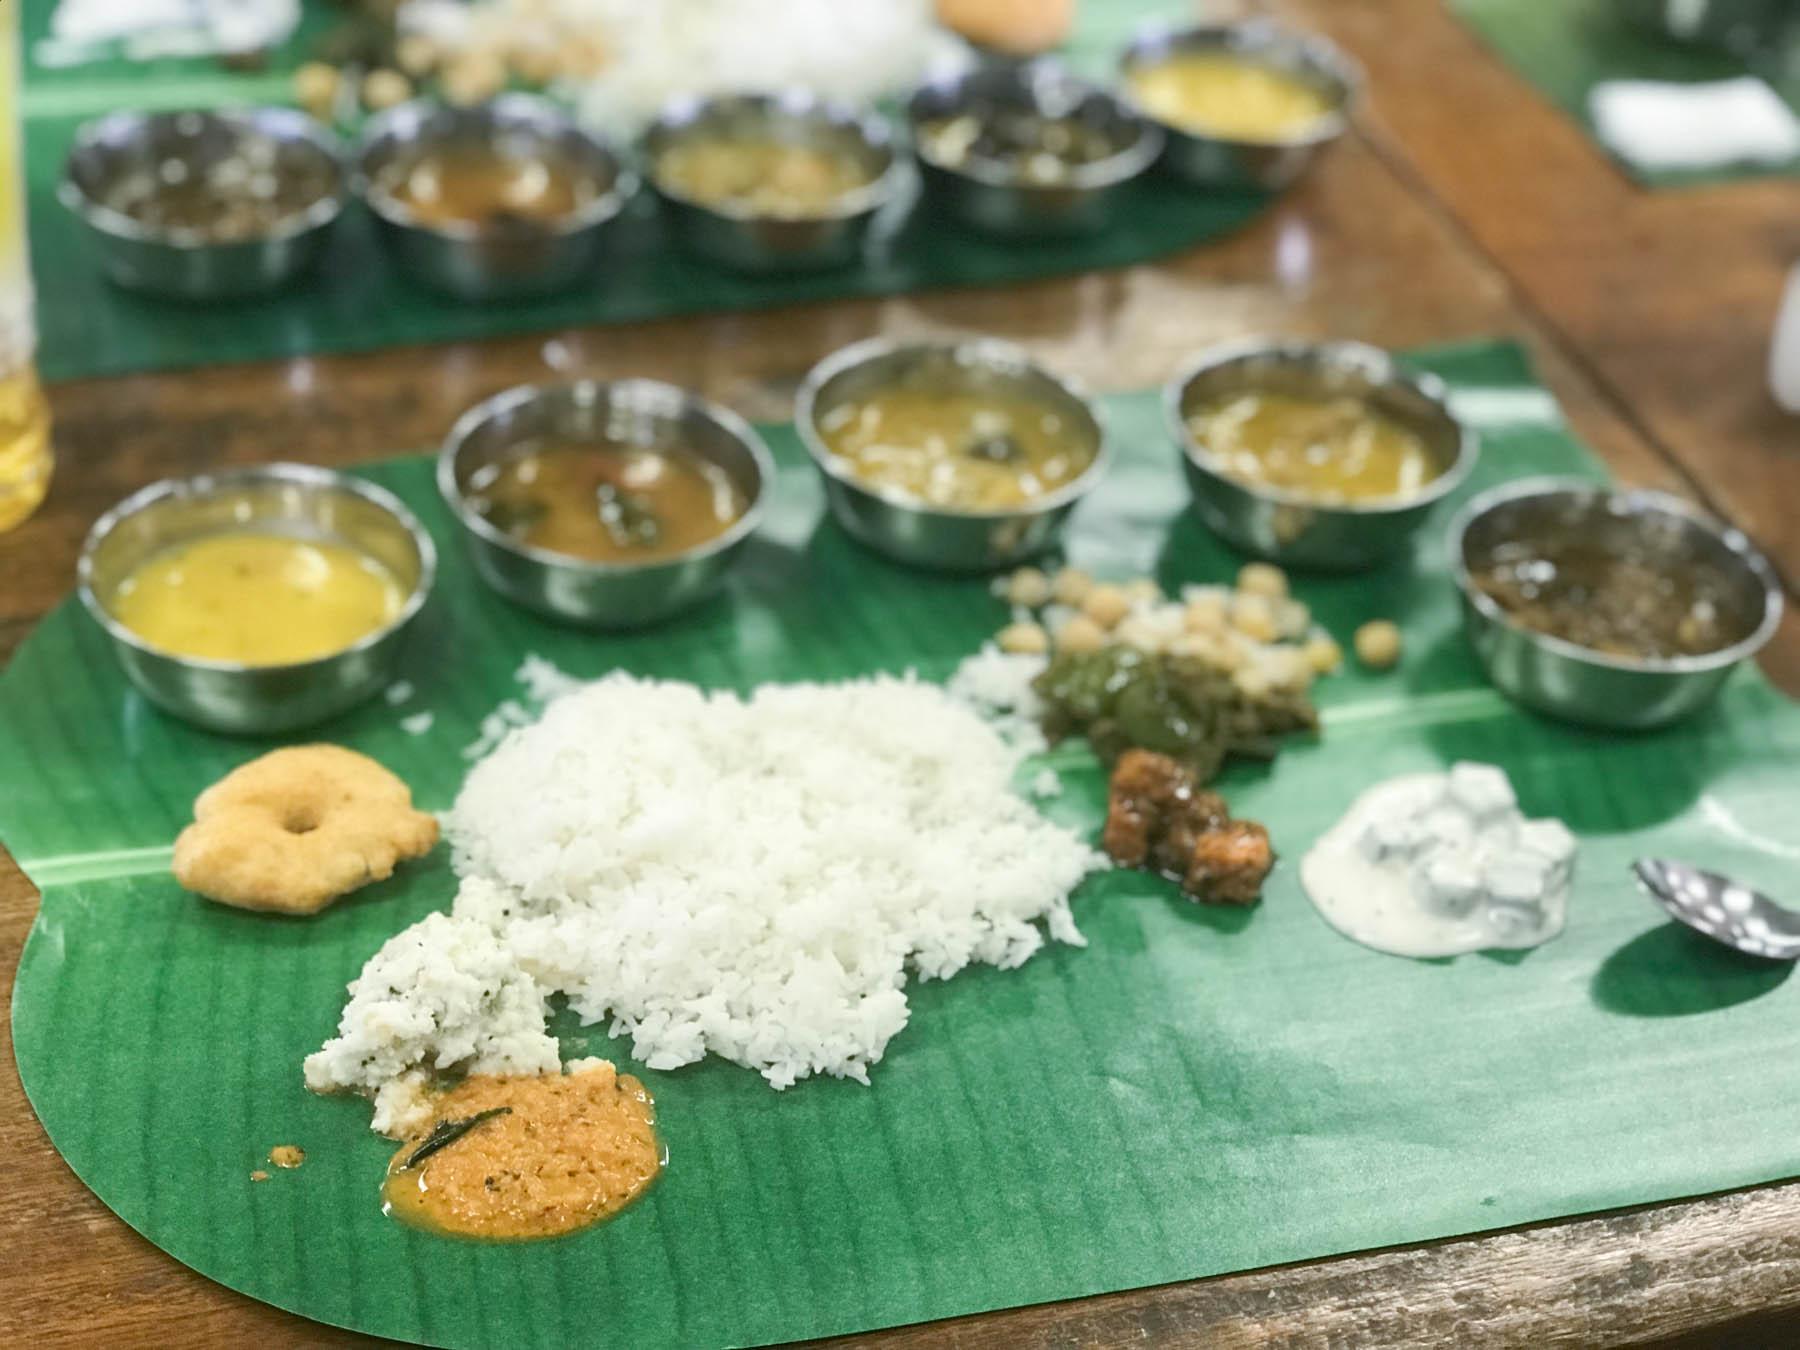 第26回印度料理研究会ミールス 完成間近